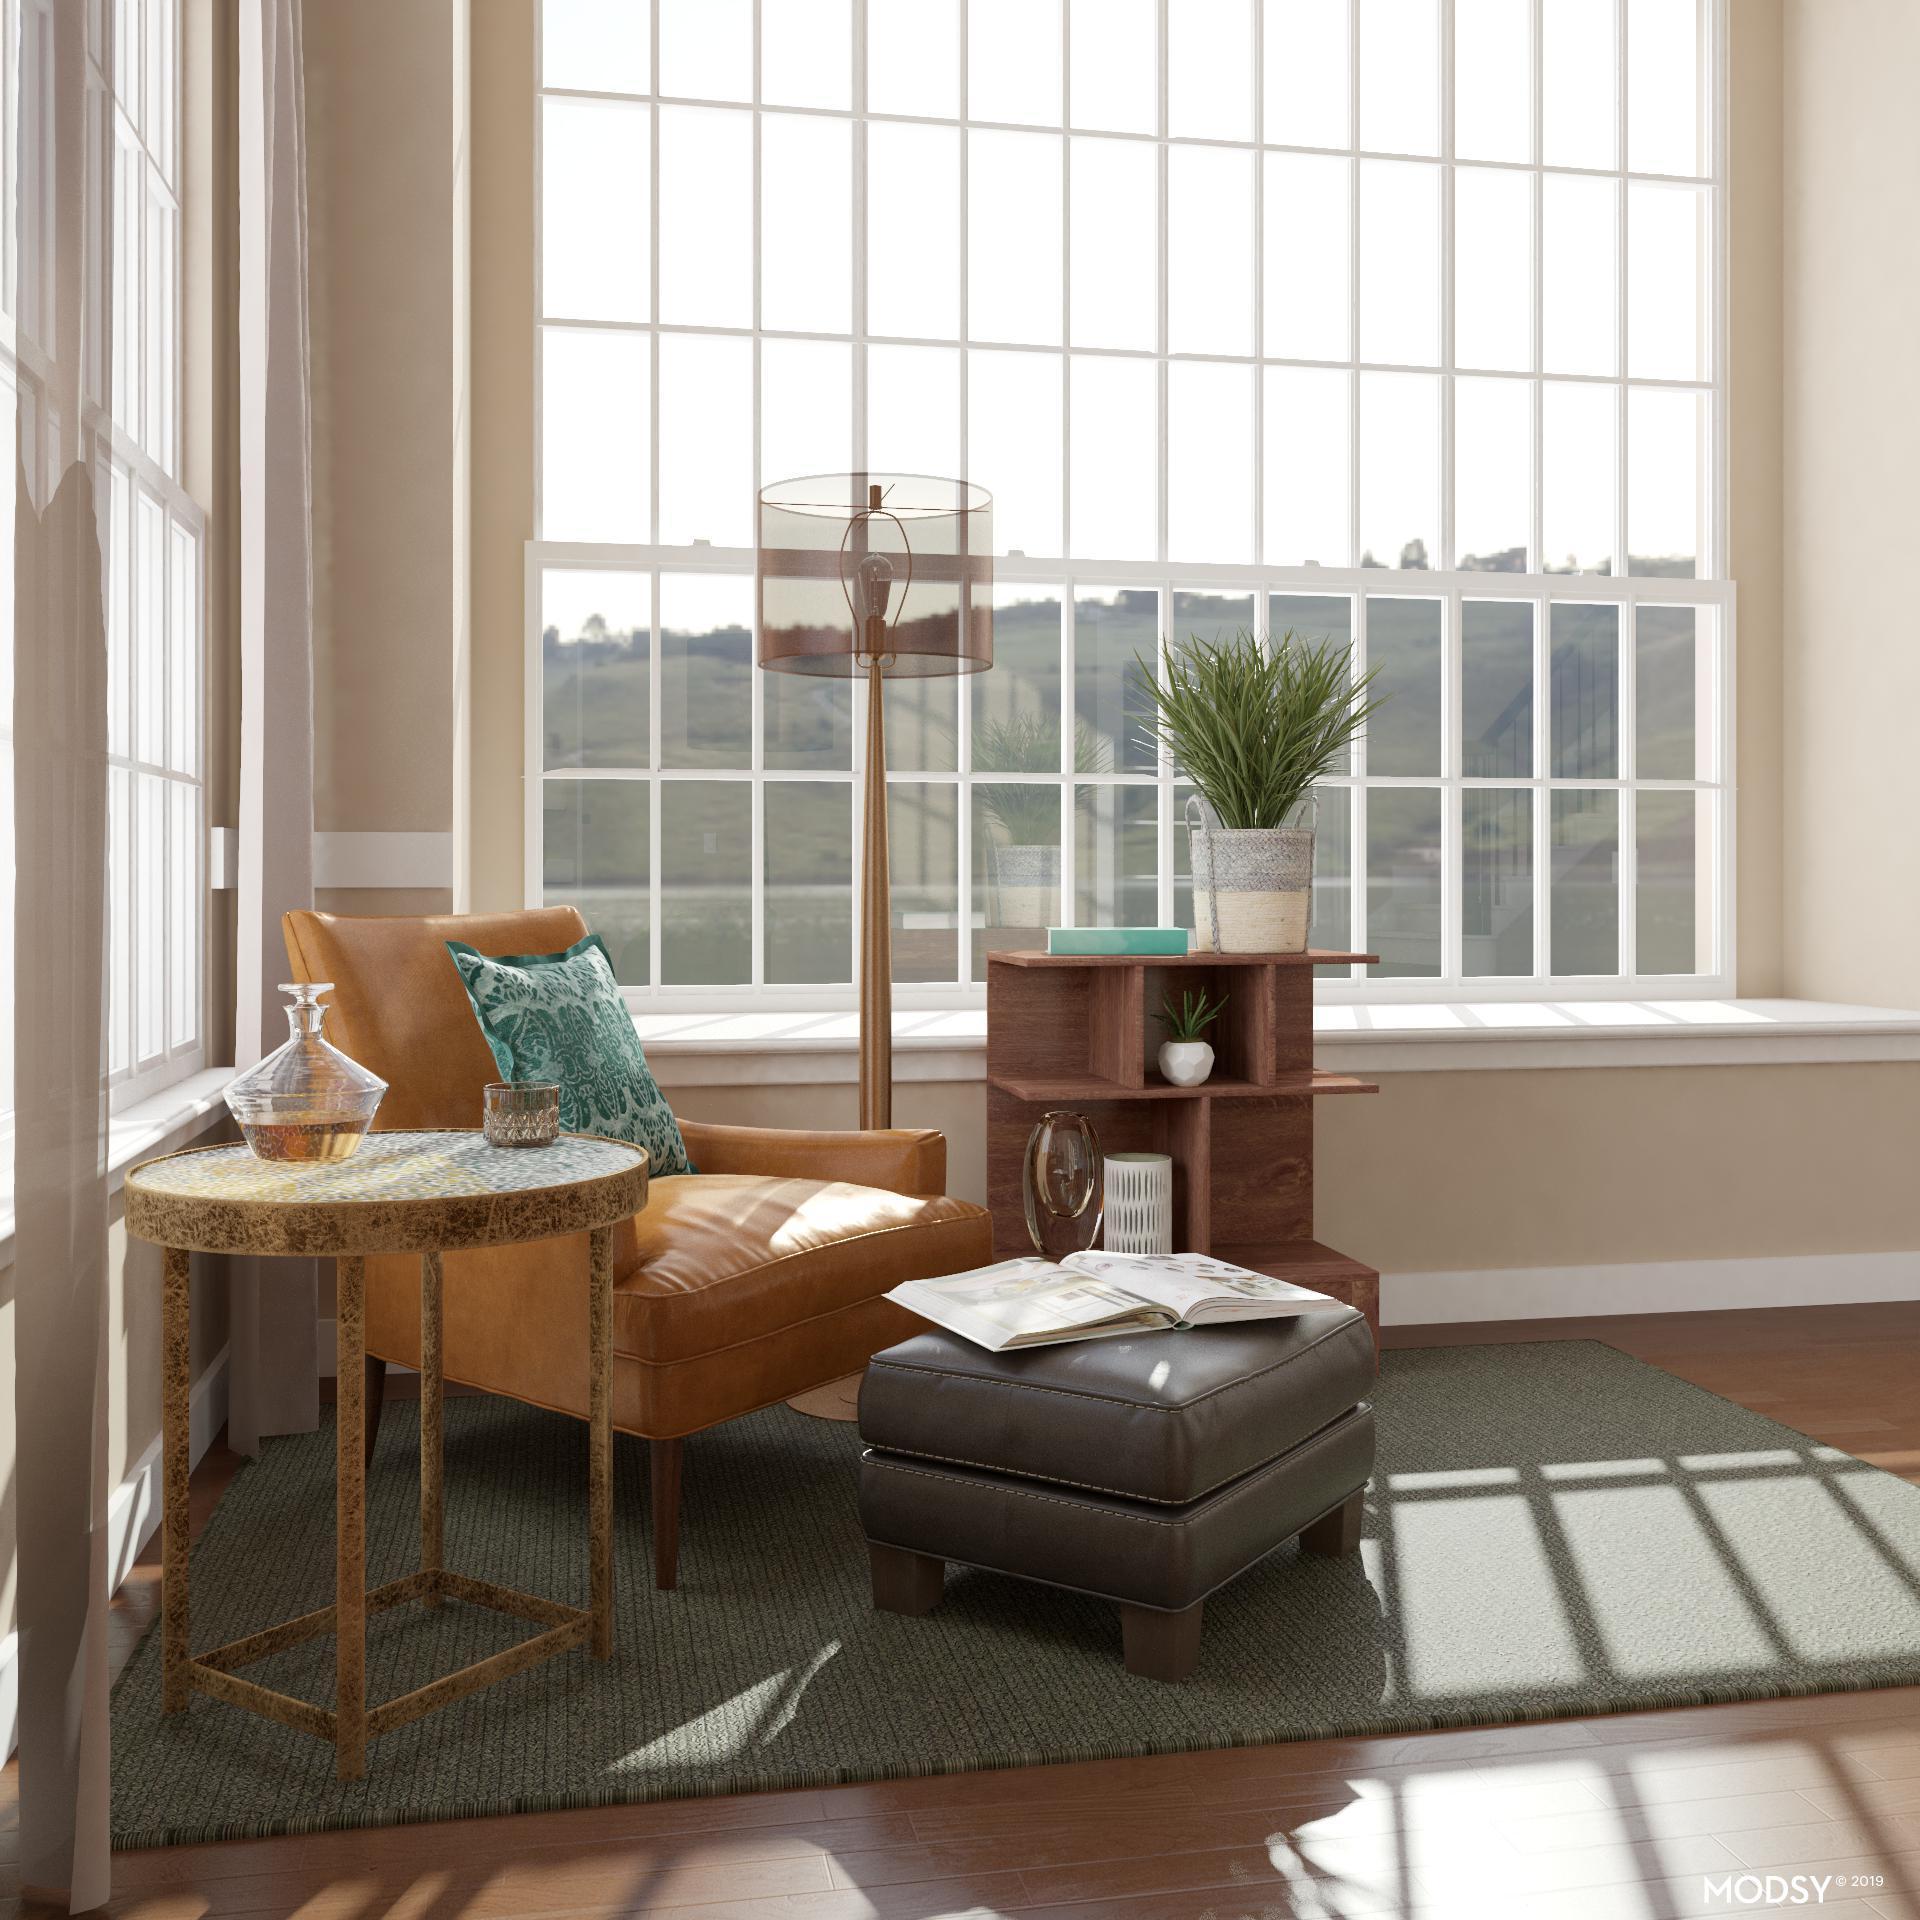 Minimalist Office With Deep Earthy Tones